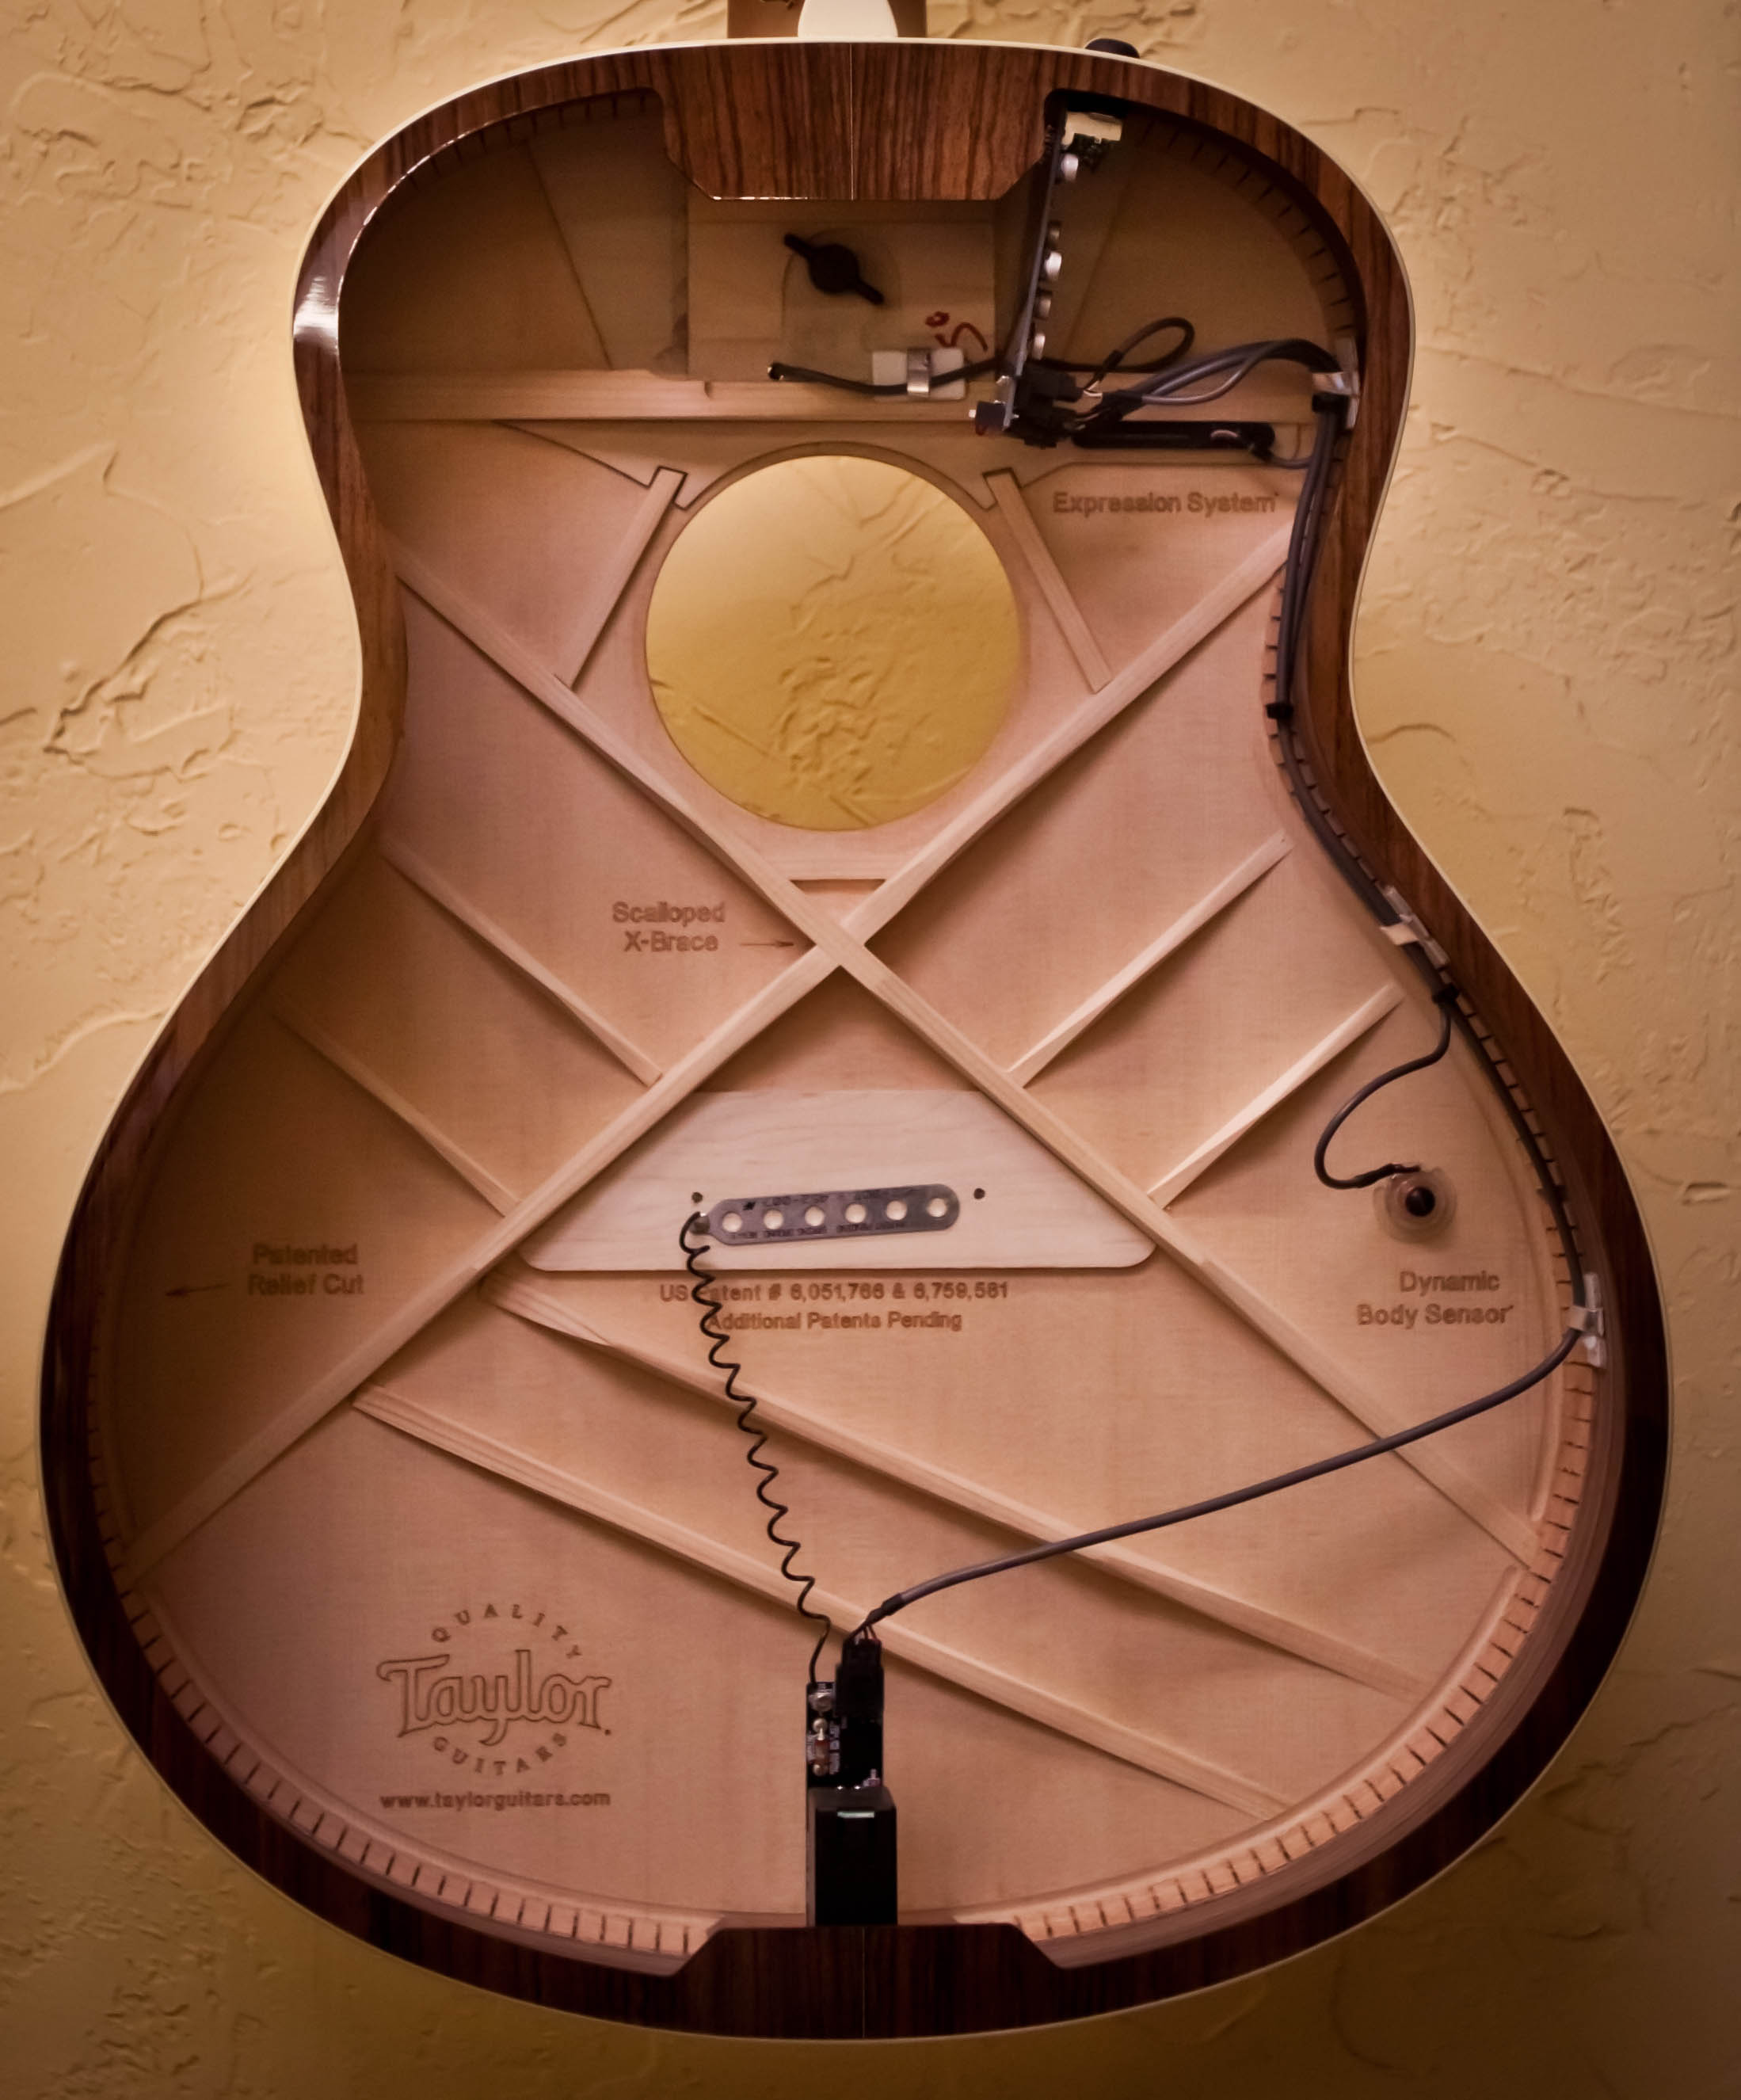 Taylor Guitar Wiring Diagram File Taylor Guitar Insides Taylor Guitar Factory Tour